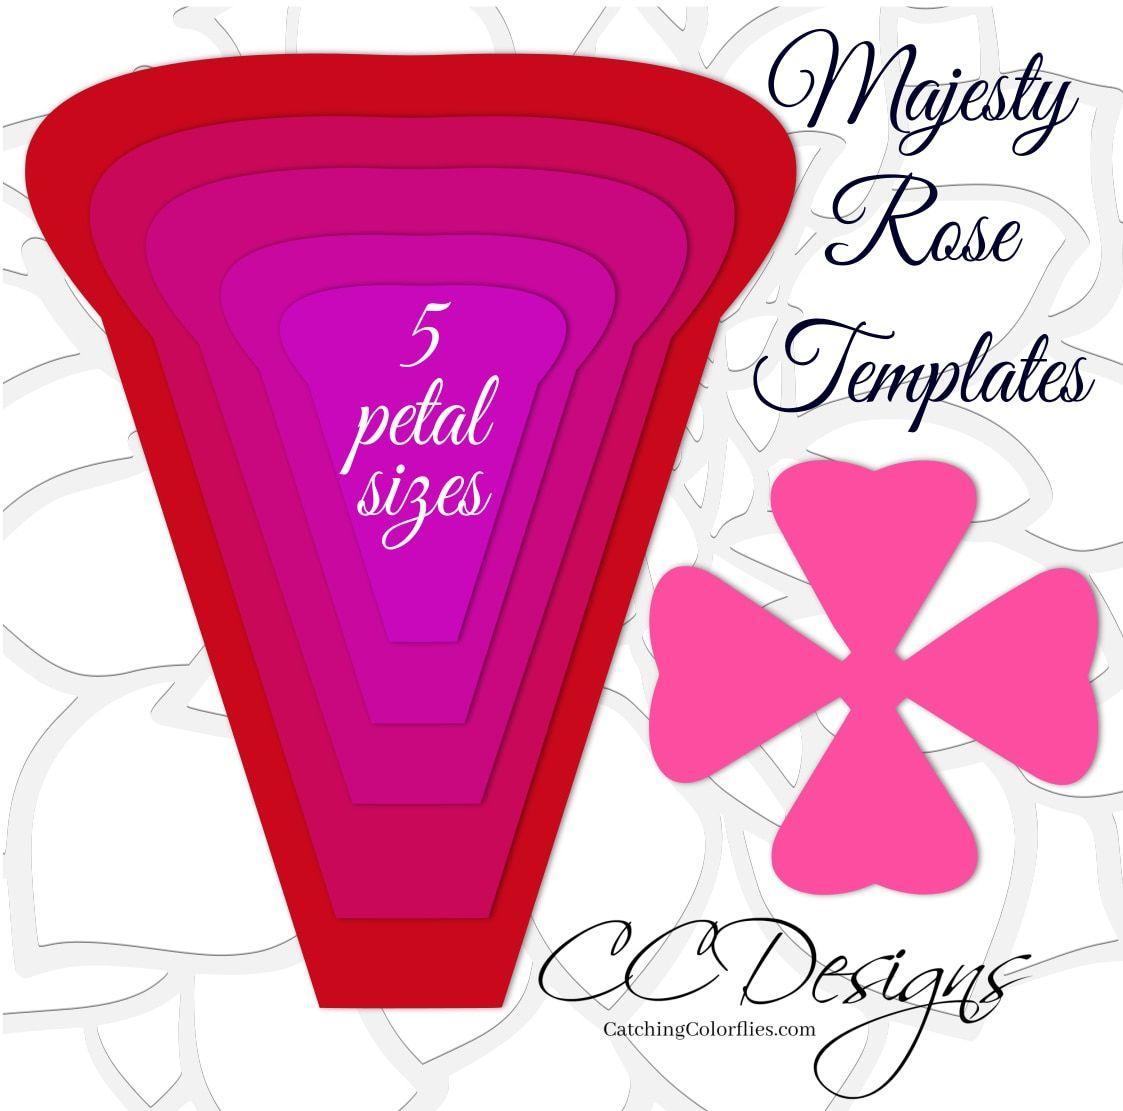 Majesty Style Rose Giant Paper Rose Templates  Molde  Pinterest